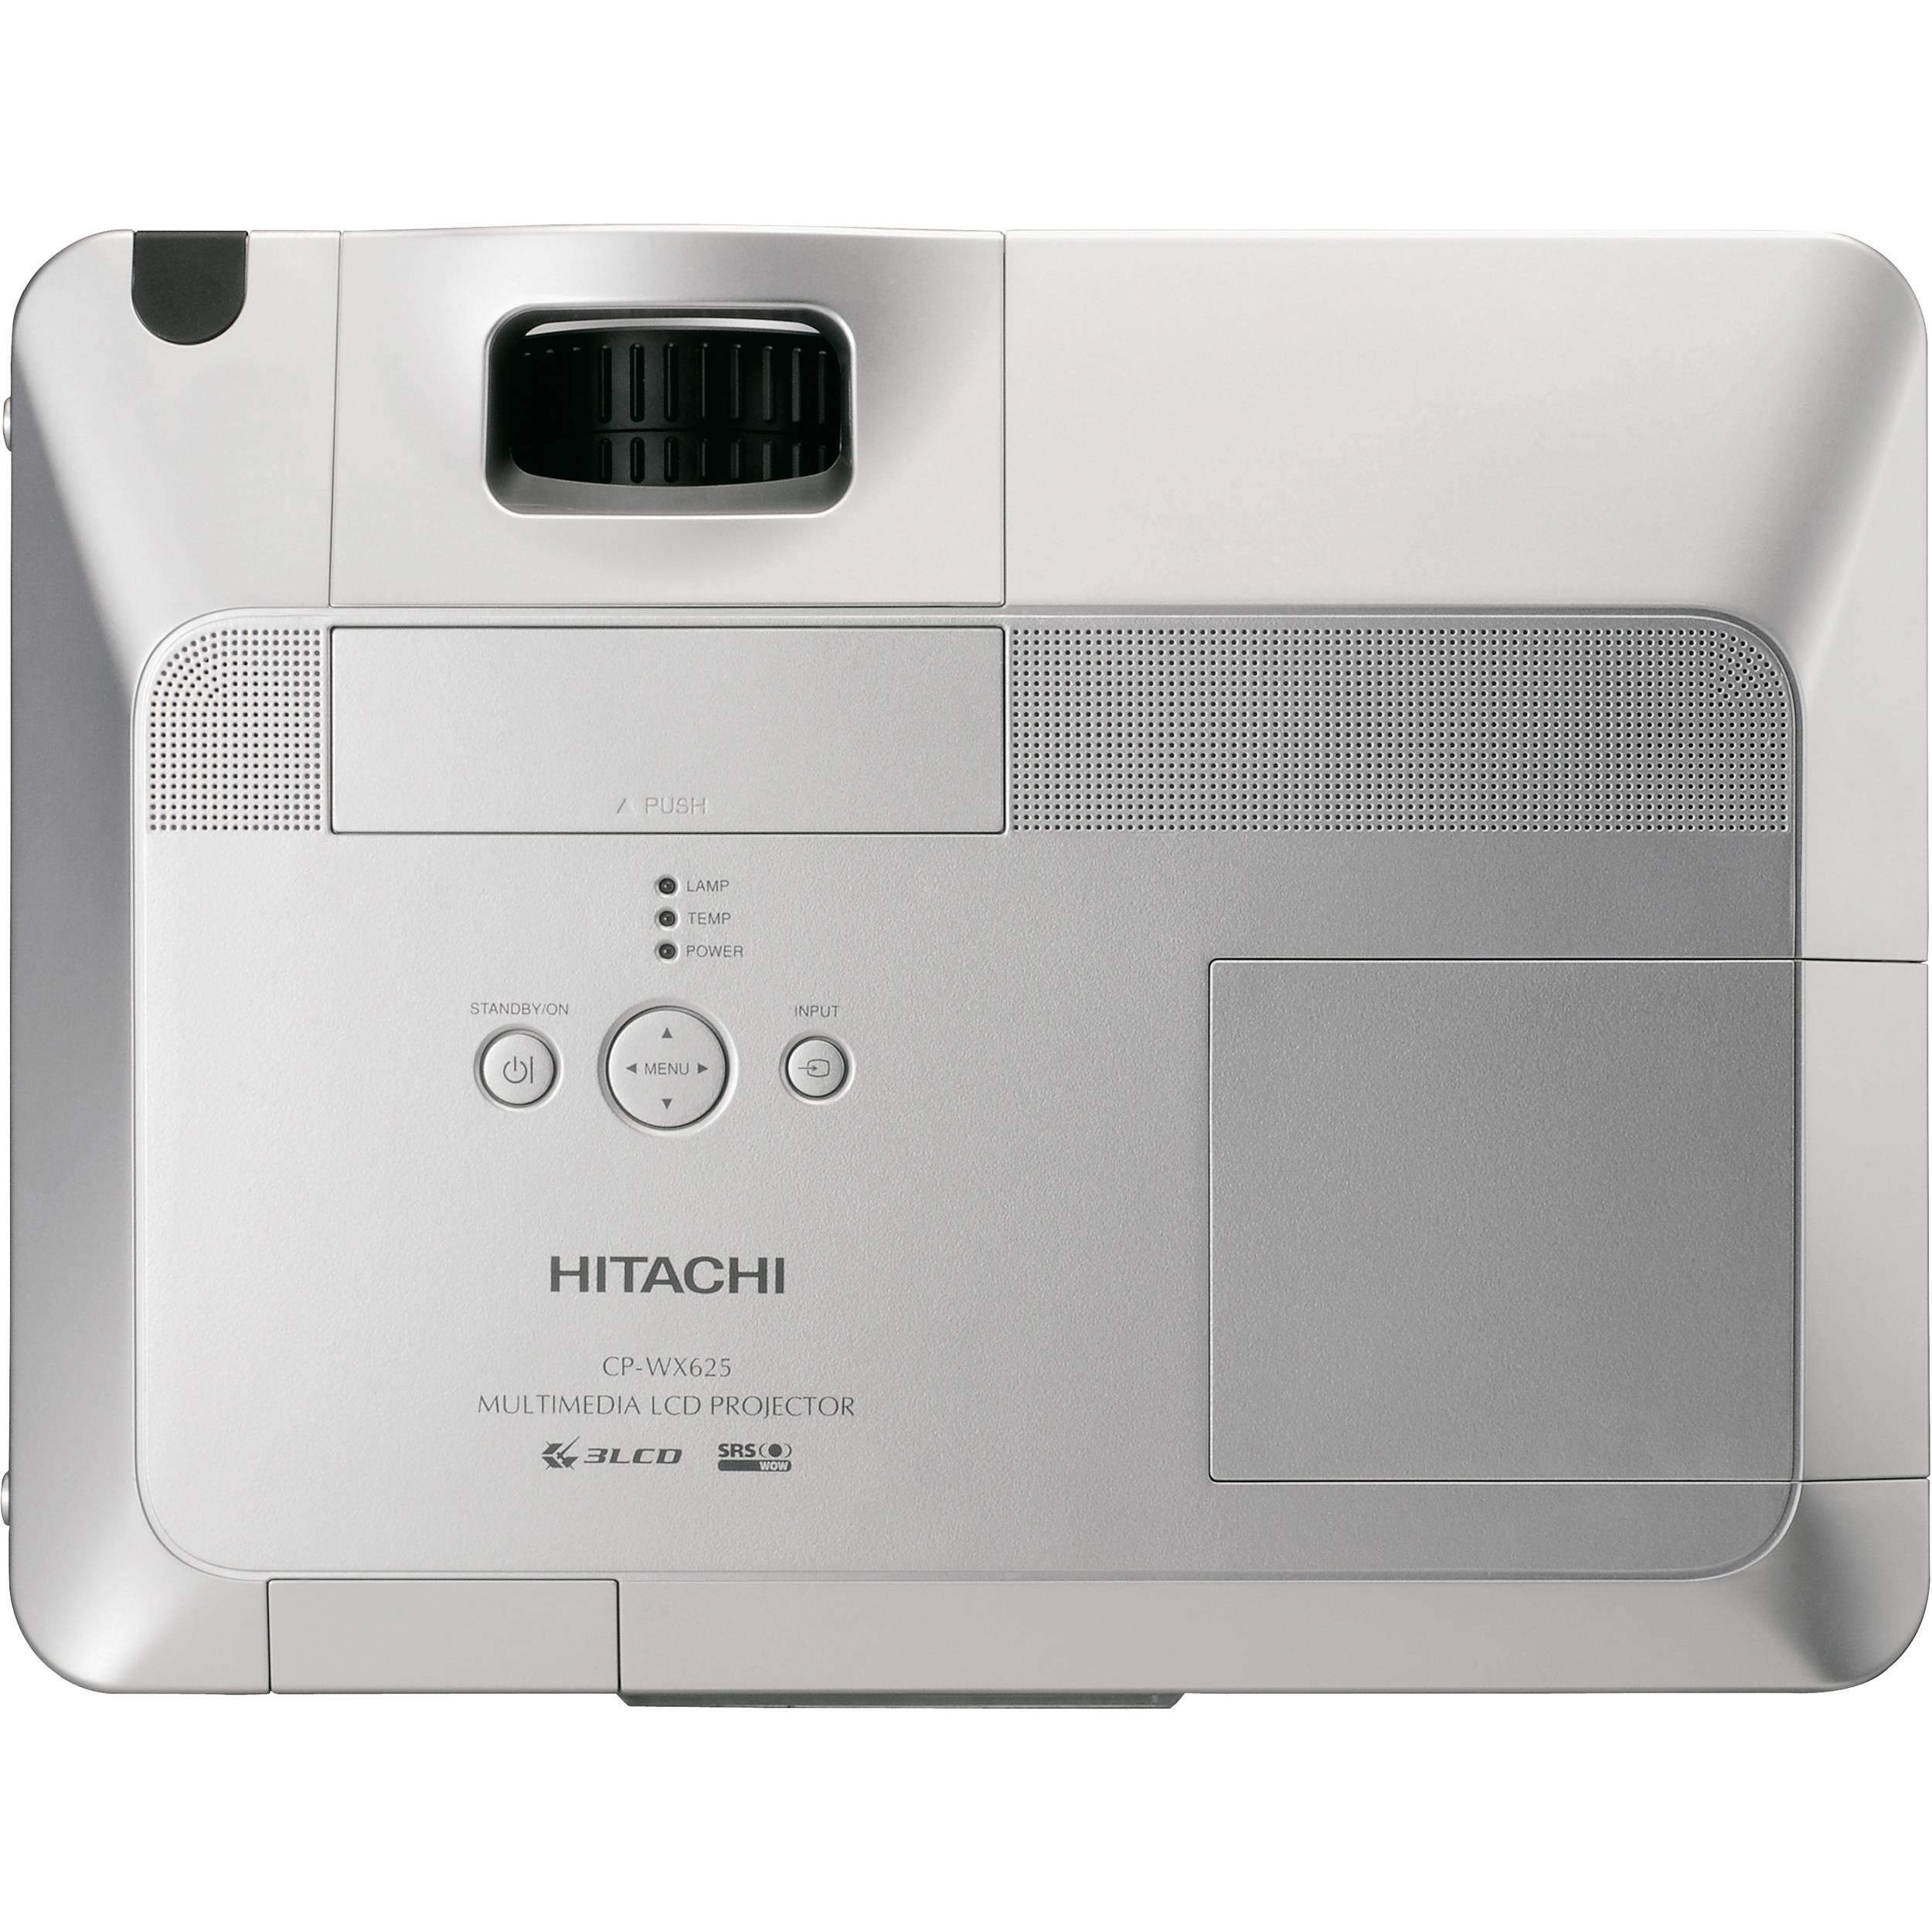 Hitachi CP-WX625 3LCD Projector 4000 Lumens HD 1080i HDMI Port W// Power Cord